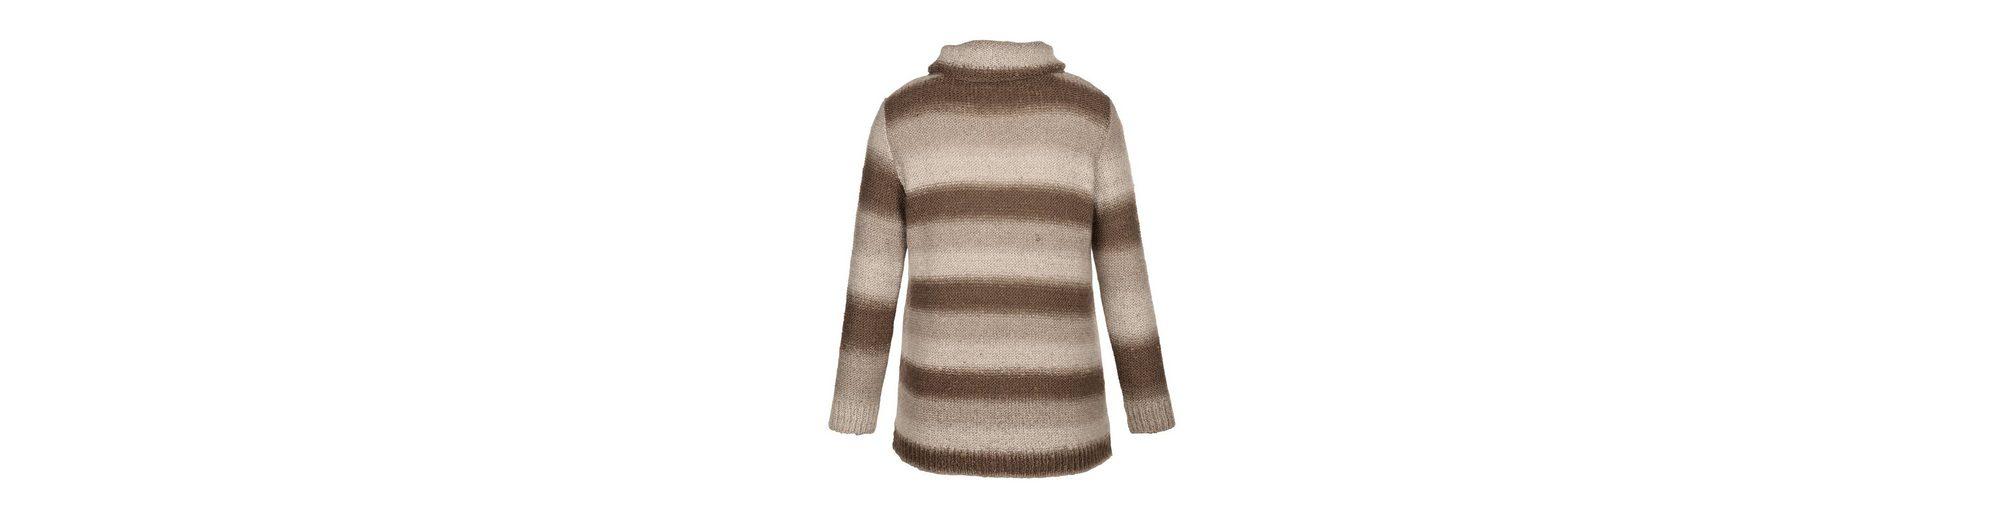 MIAMODA Pullover Bilder Rabatt-Shop Billig OxMSq